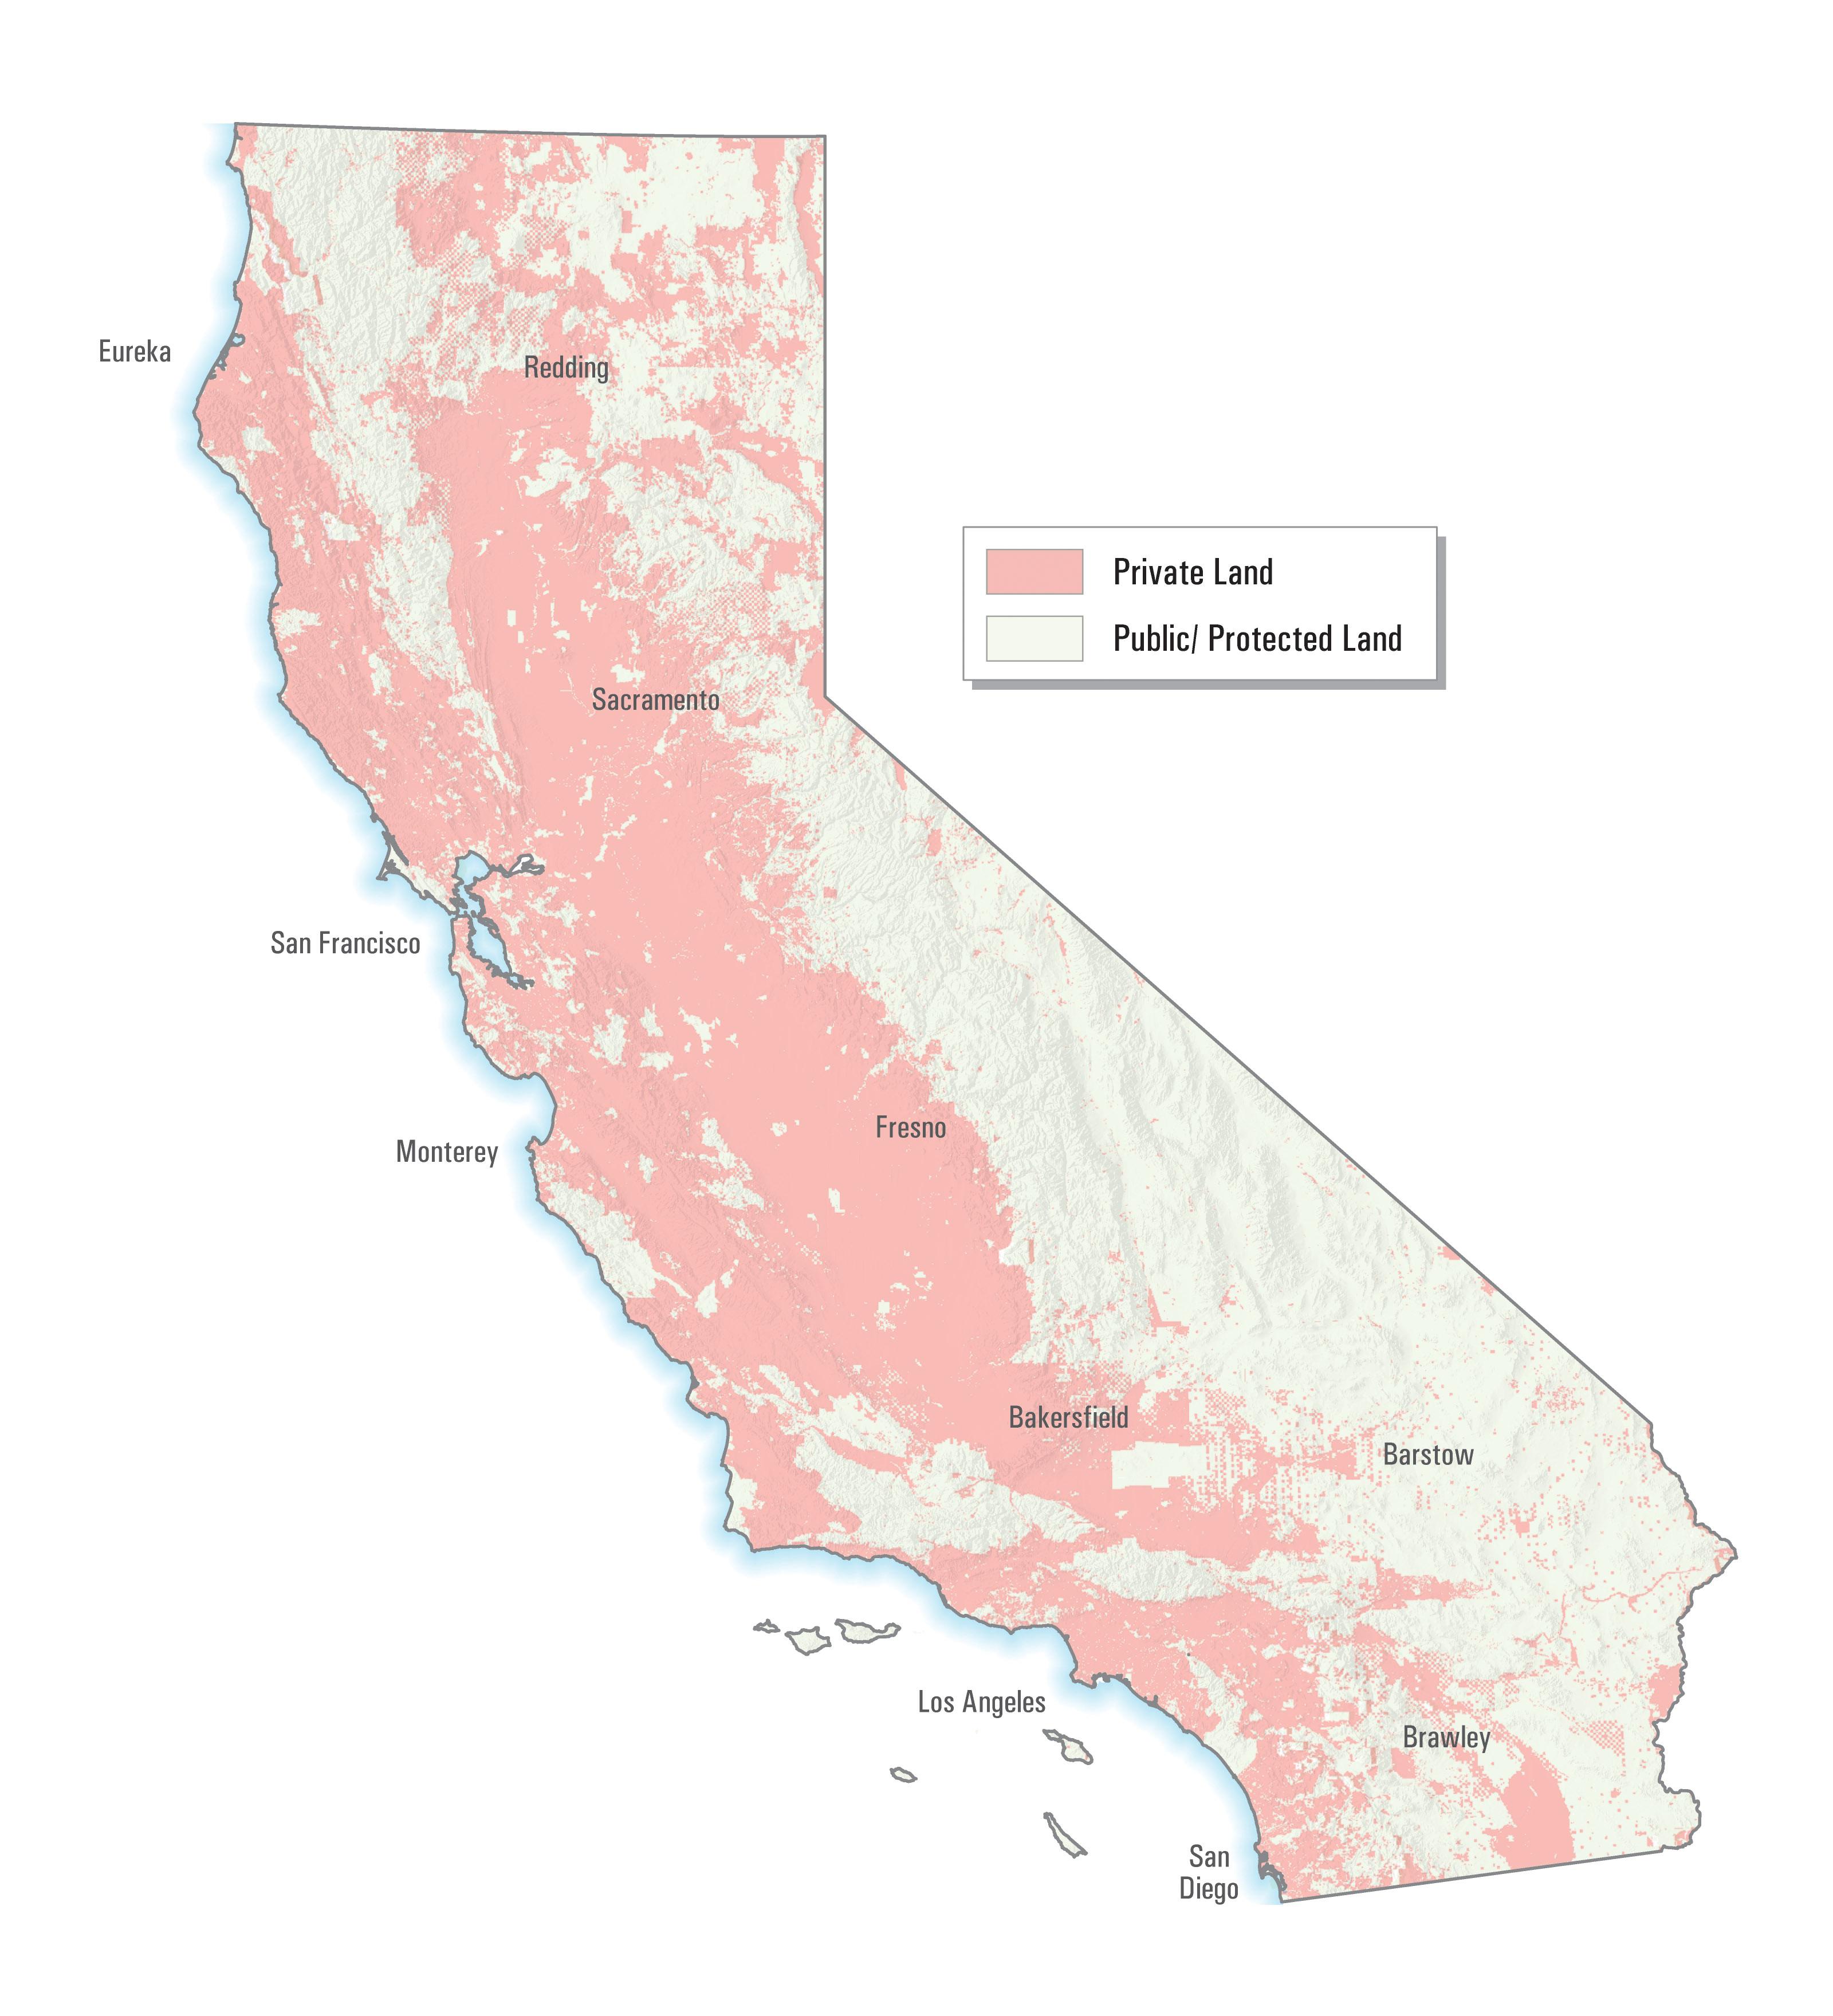 Public Land Maps California - Klipy - California Public Lands Map